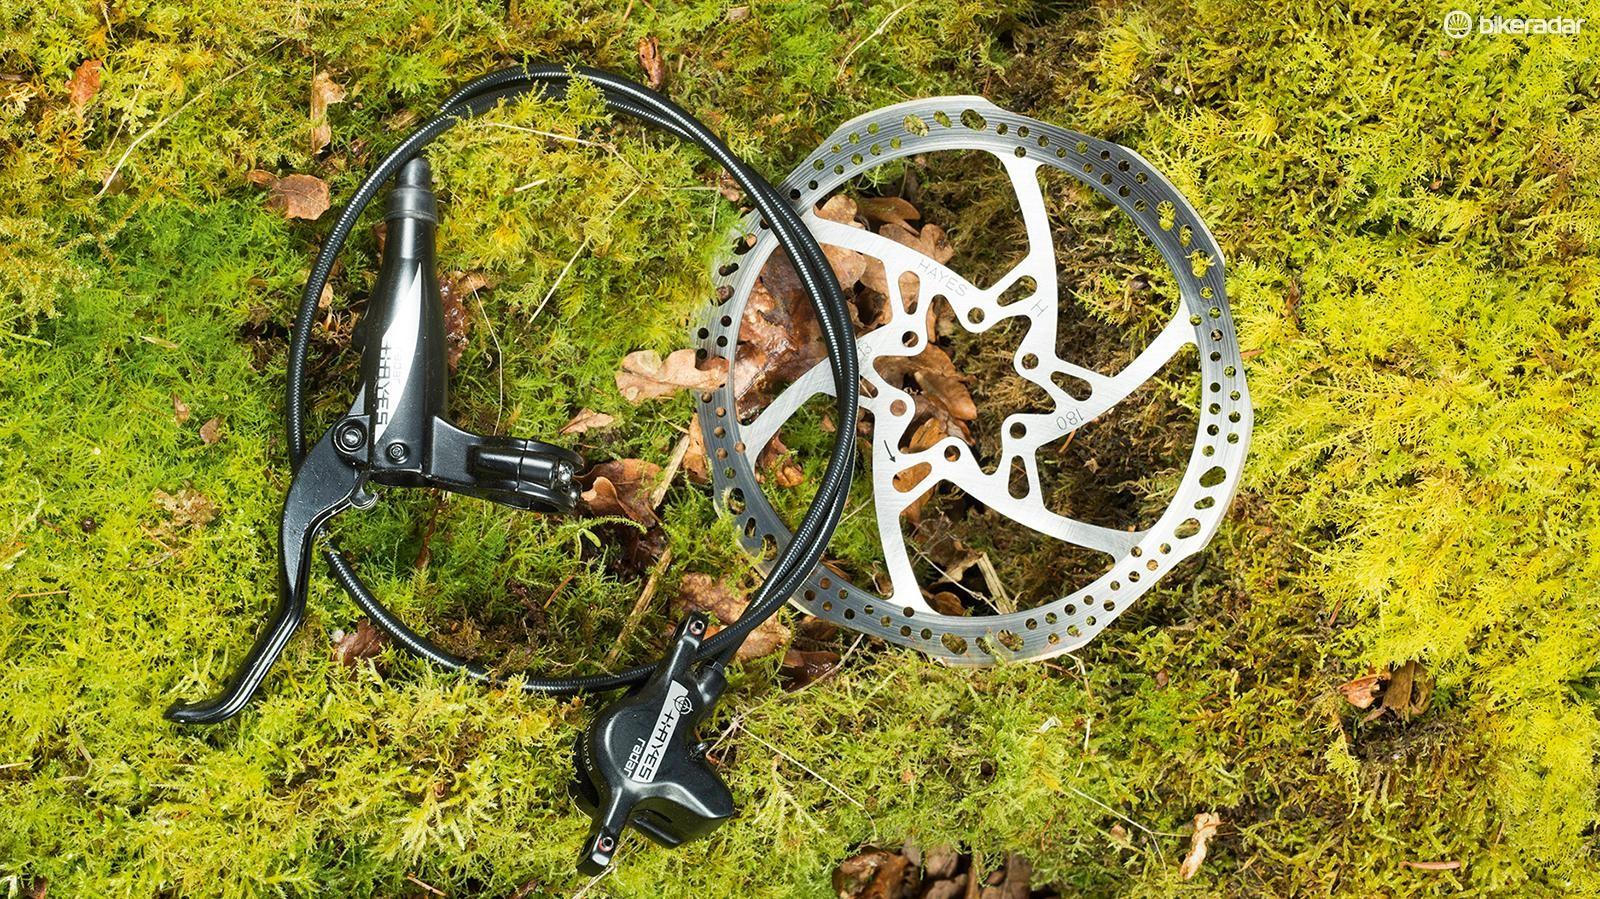 Hayes Radar disc brakes